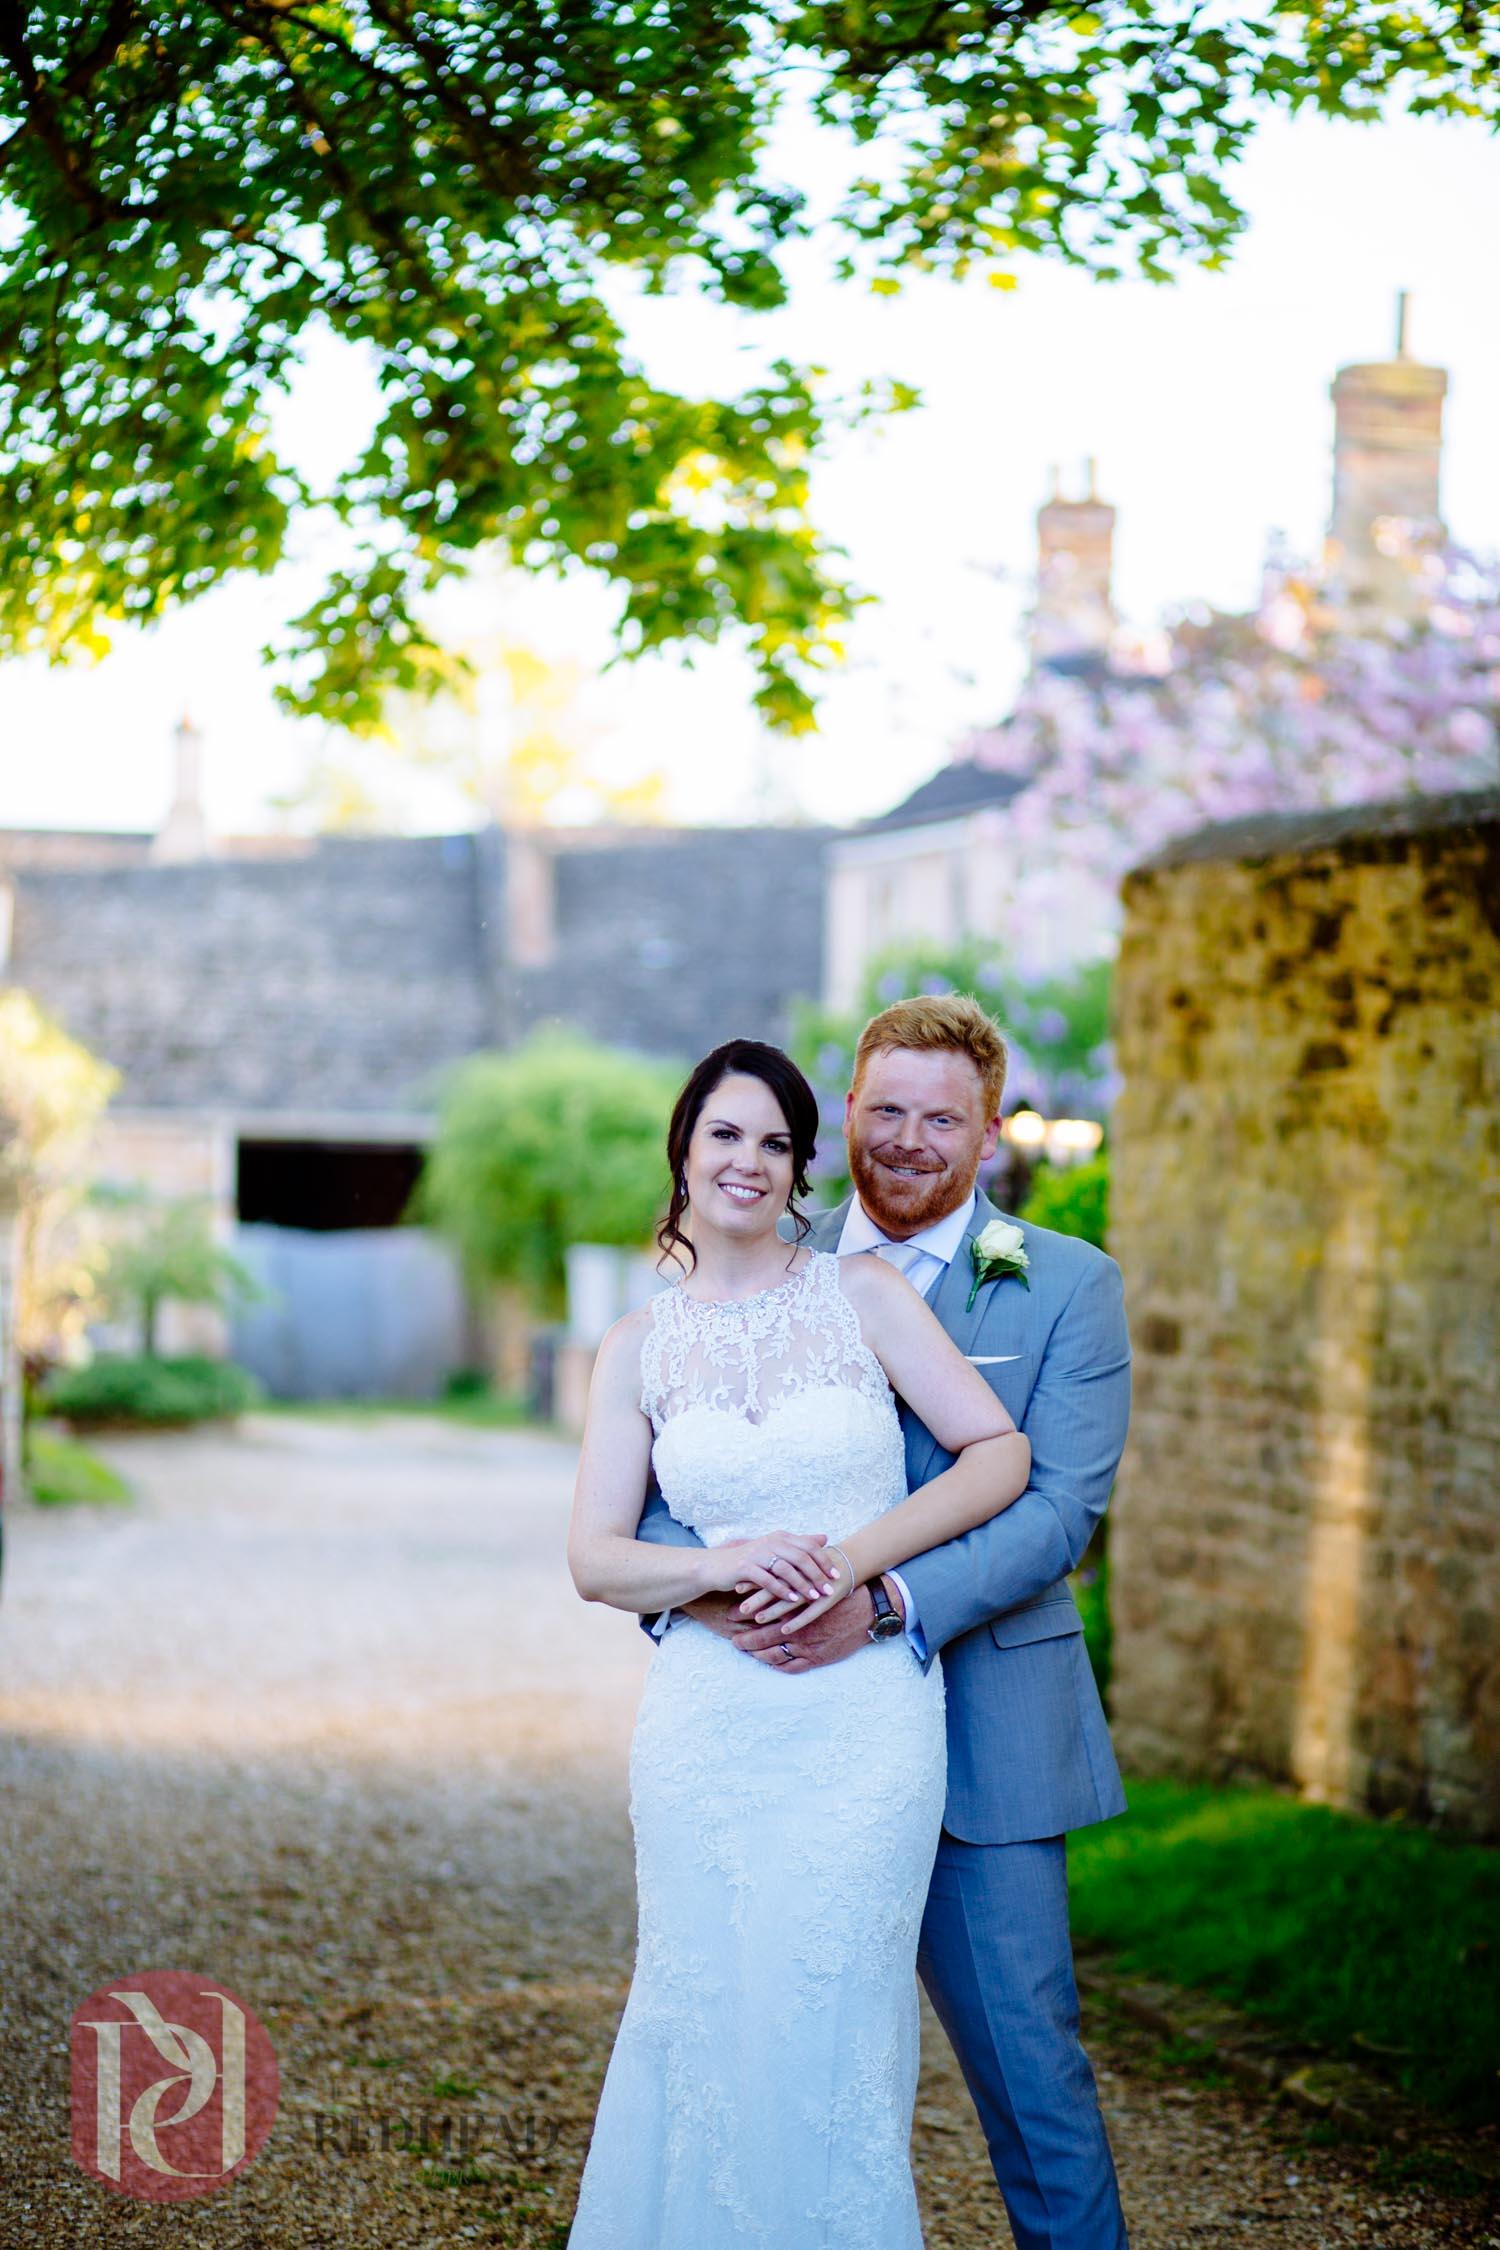 Wedding Photographer The Talbot Oundle   Steven & Laura